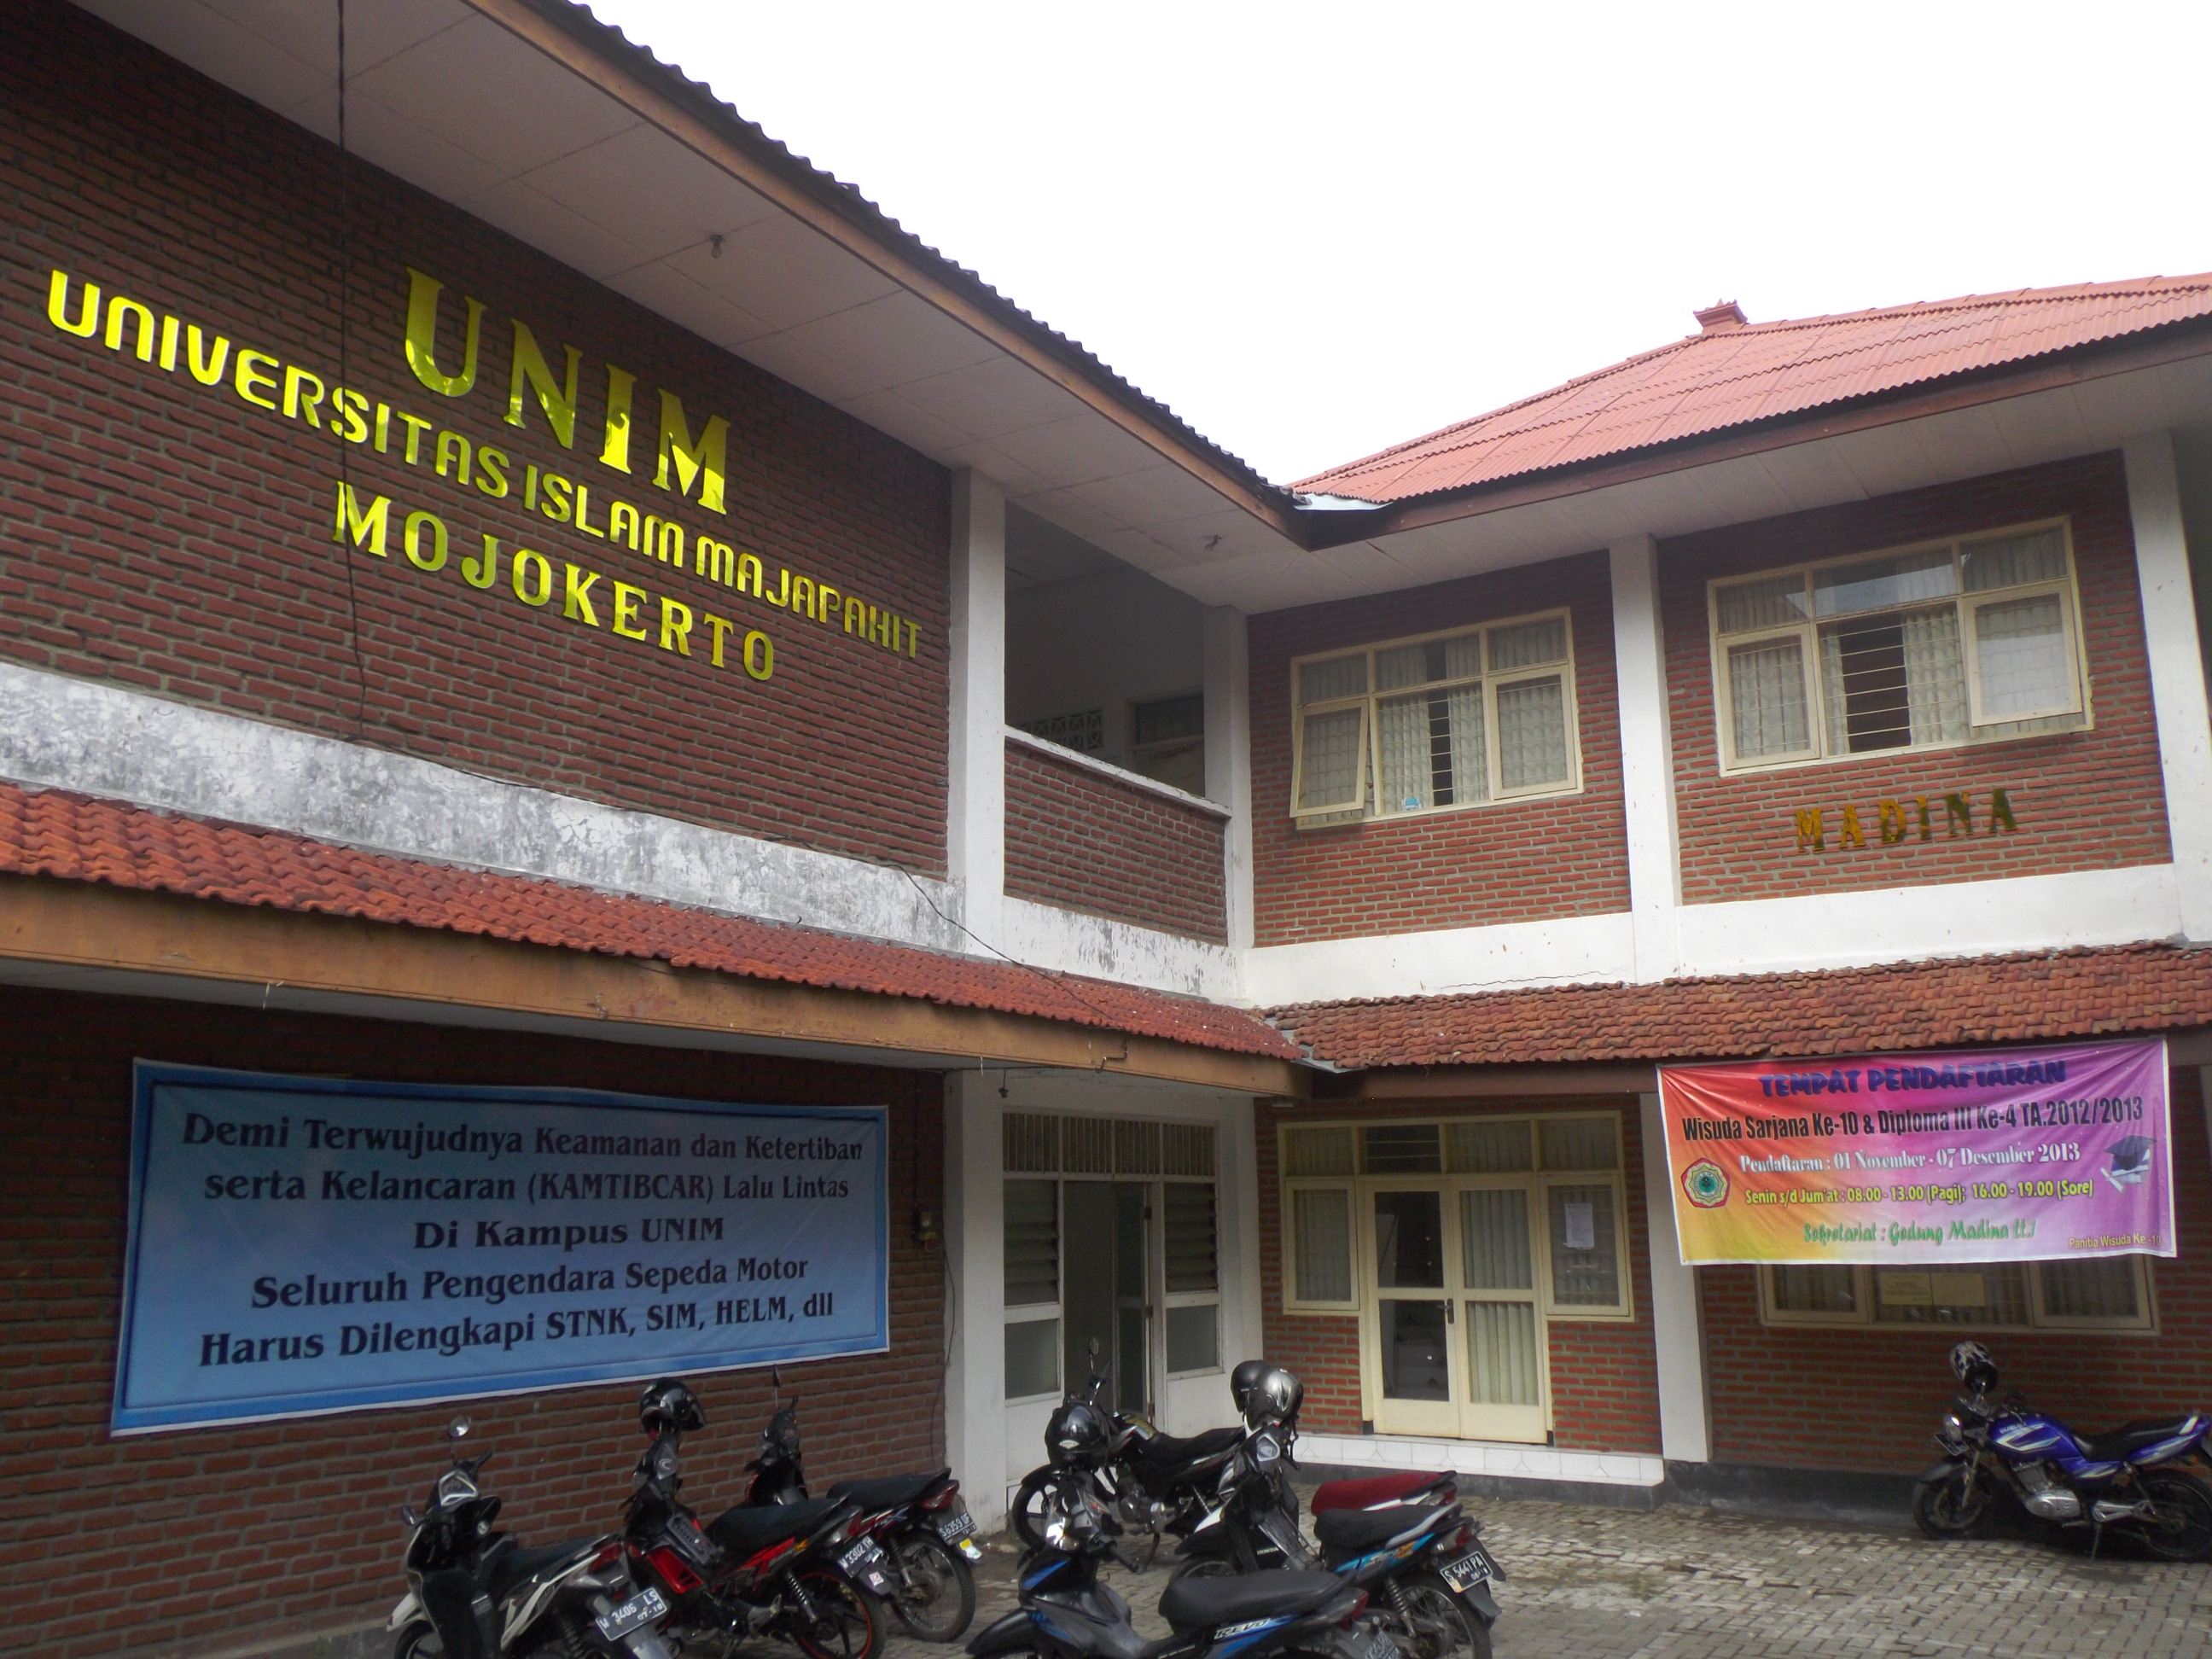 Pendaftaran Universitas Islam Majapahit (UNIM) Mojokerto